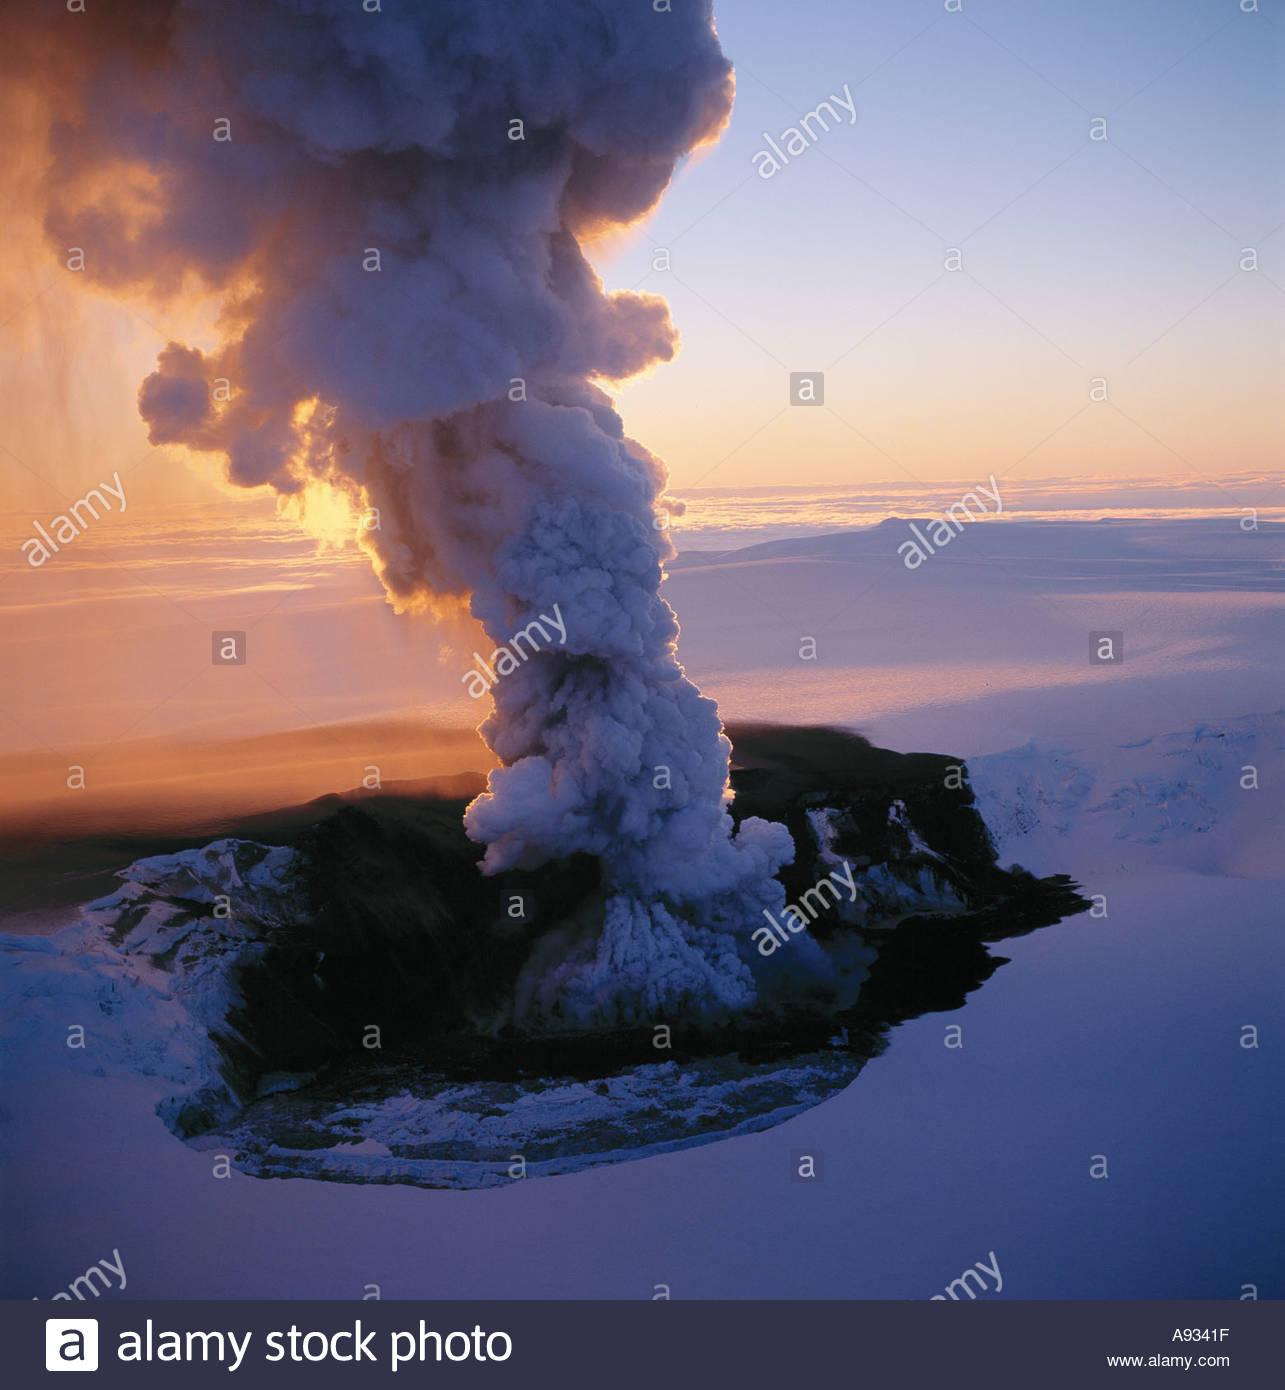 A volcanic eruption in Grimsvotn in Vatnajokull in Iceland 1998 - Stock Image